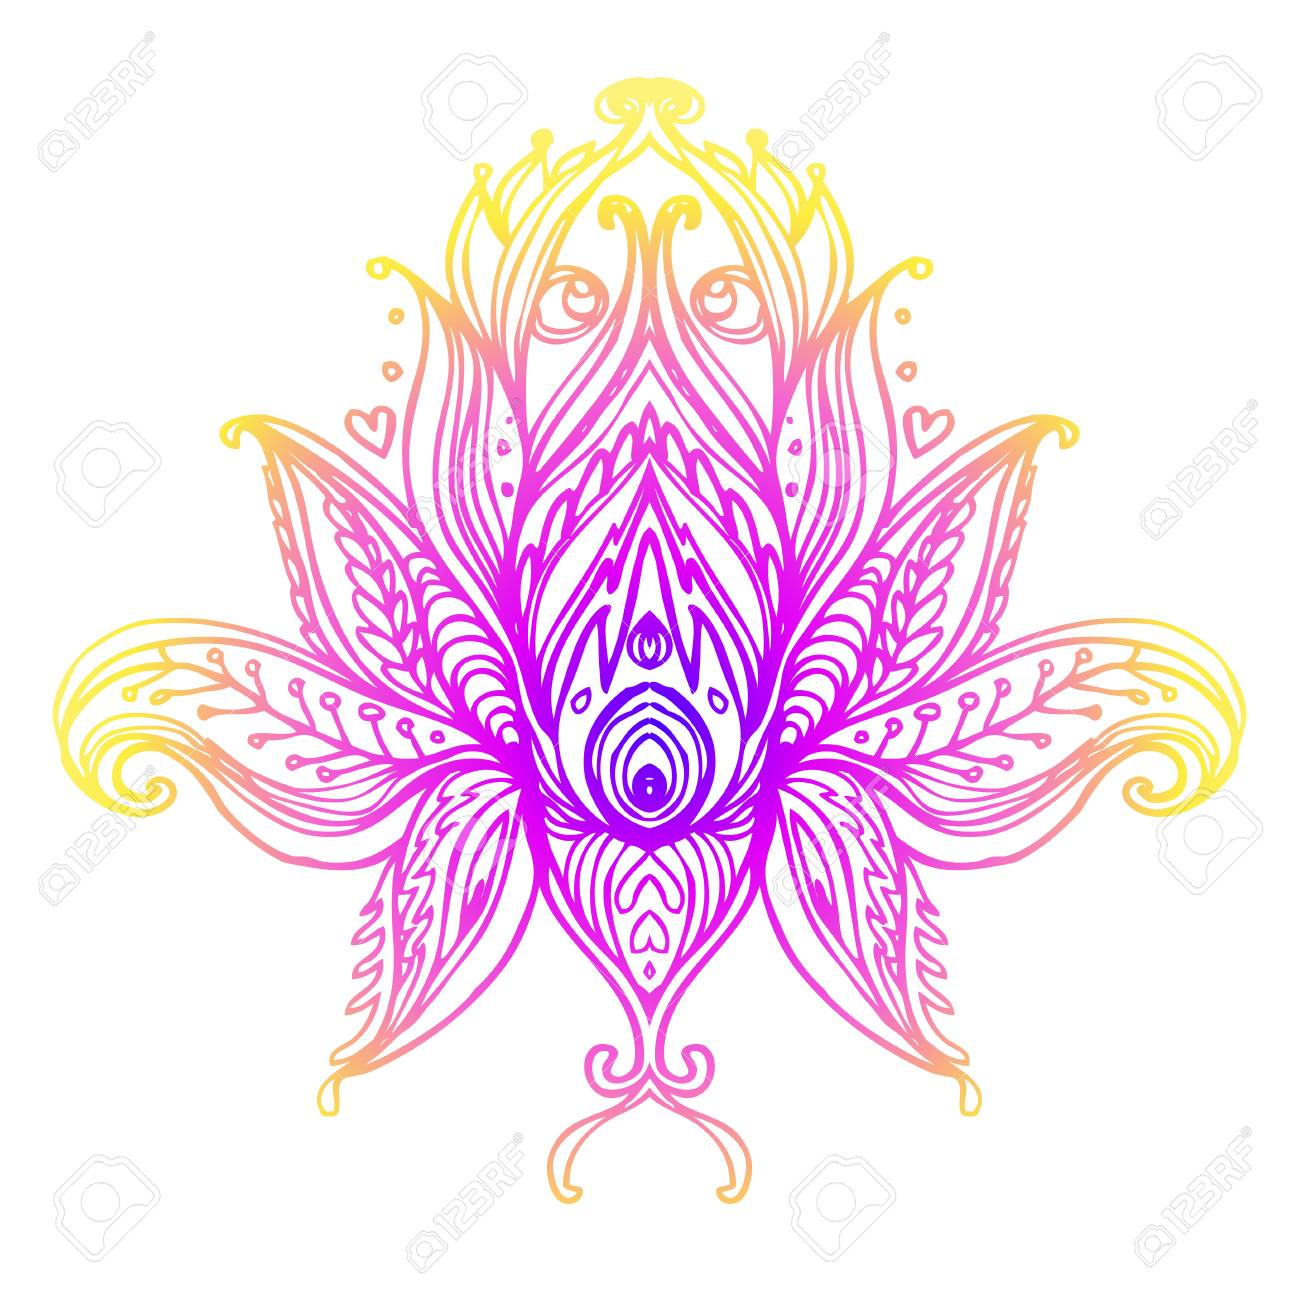 Vector Ornamental Lotus Flower Ethnic Art Patterned Indian